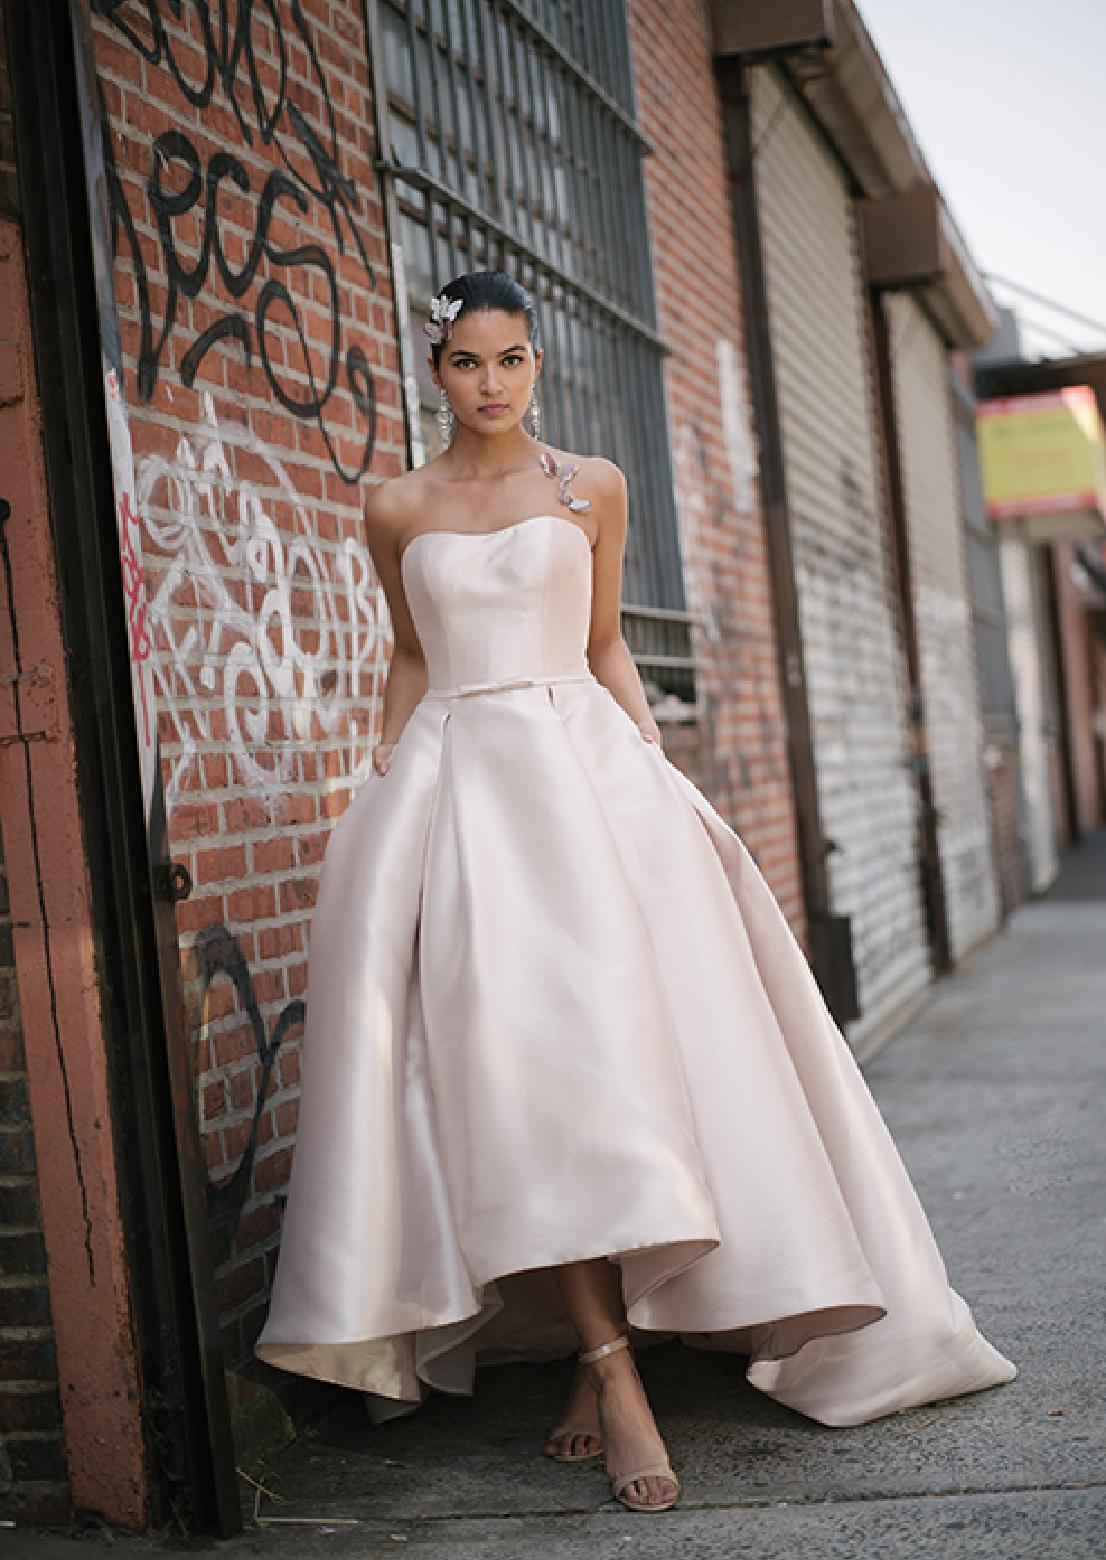 wedding dresses simple,simple wedding dress,simple dresses,simple wedding dress,simple wedding dress,simple dresses,simple wedding dress,plain wedding dress,simple wedding dresses,wedding dresses simple,